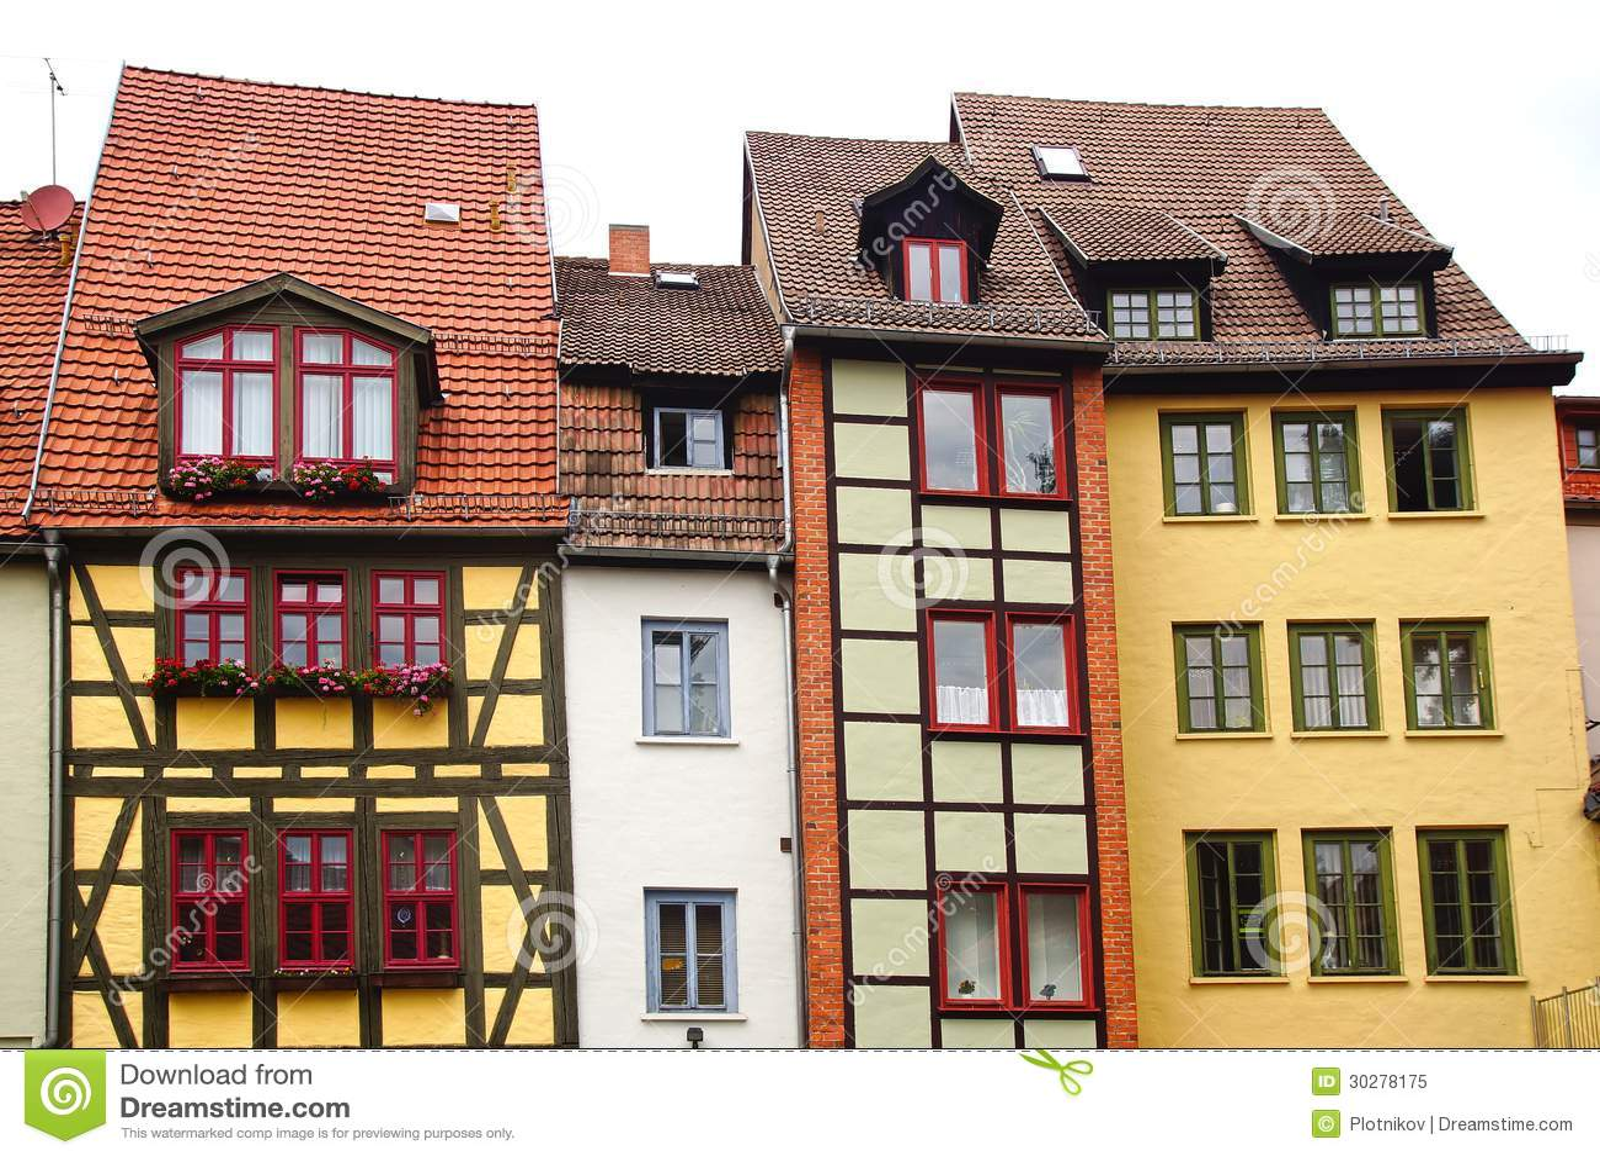 Fahverk房子在埃福特,德国